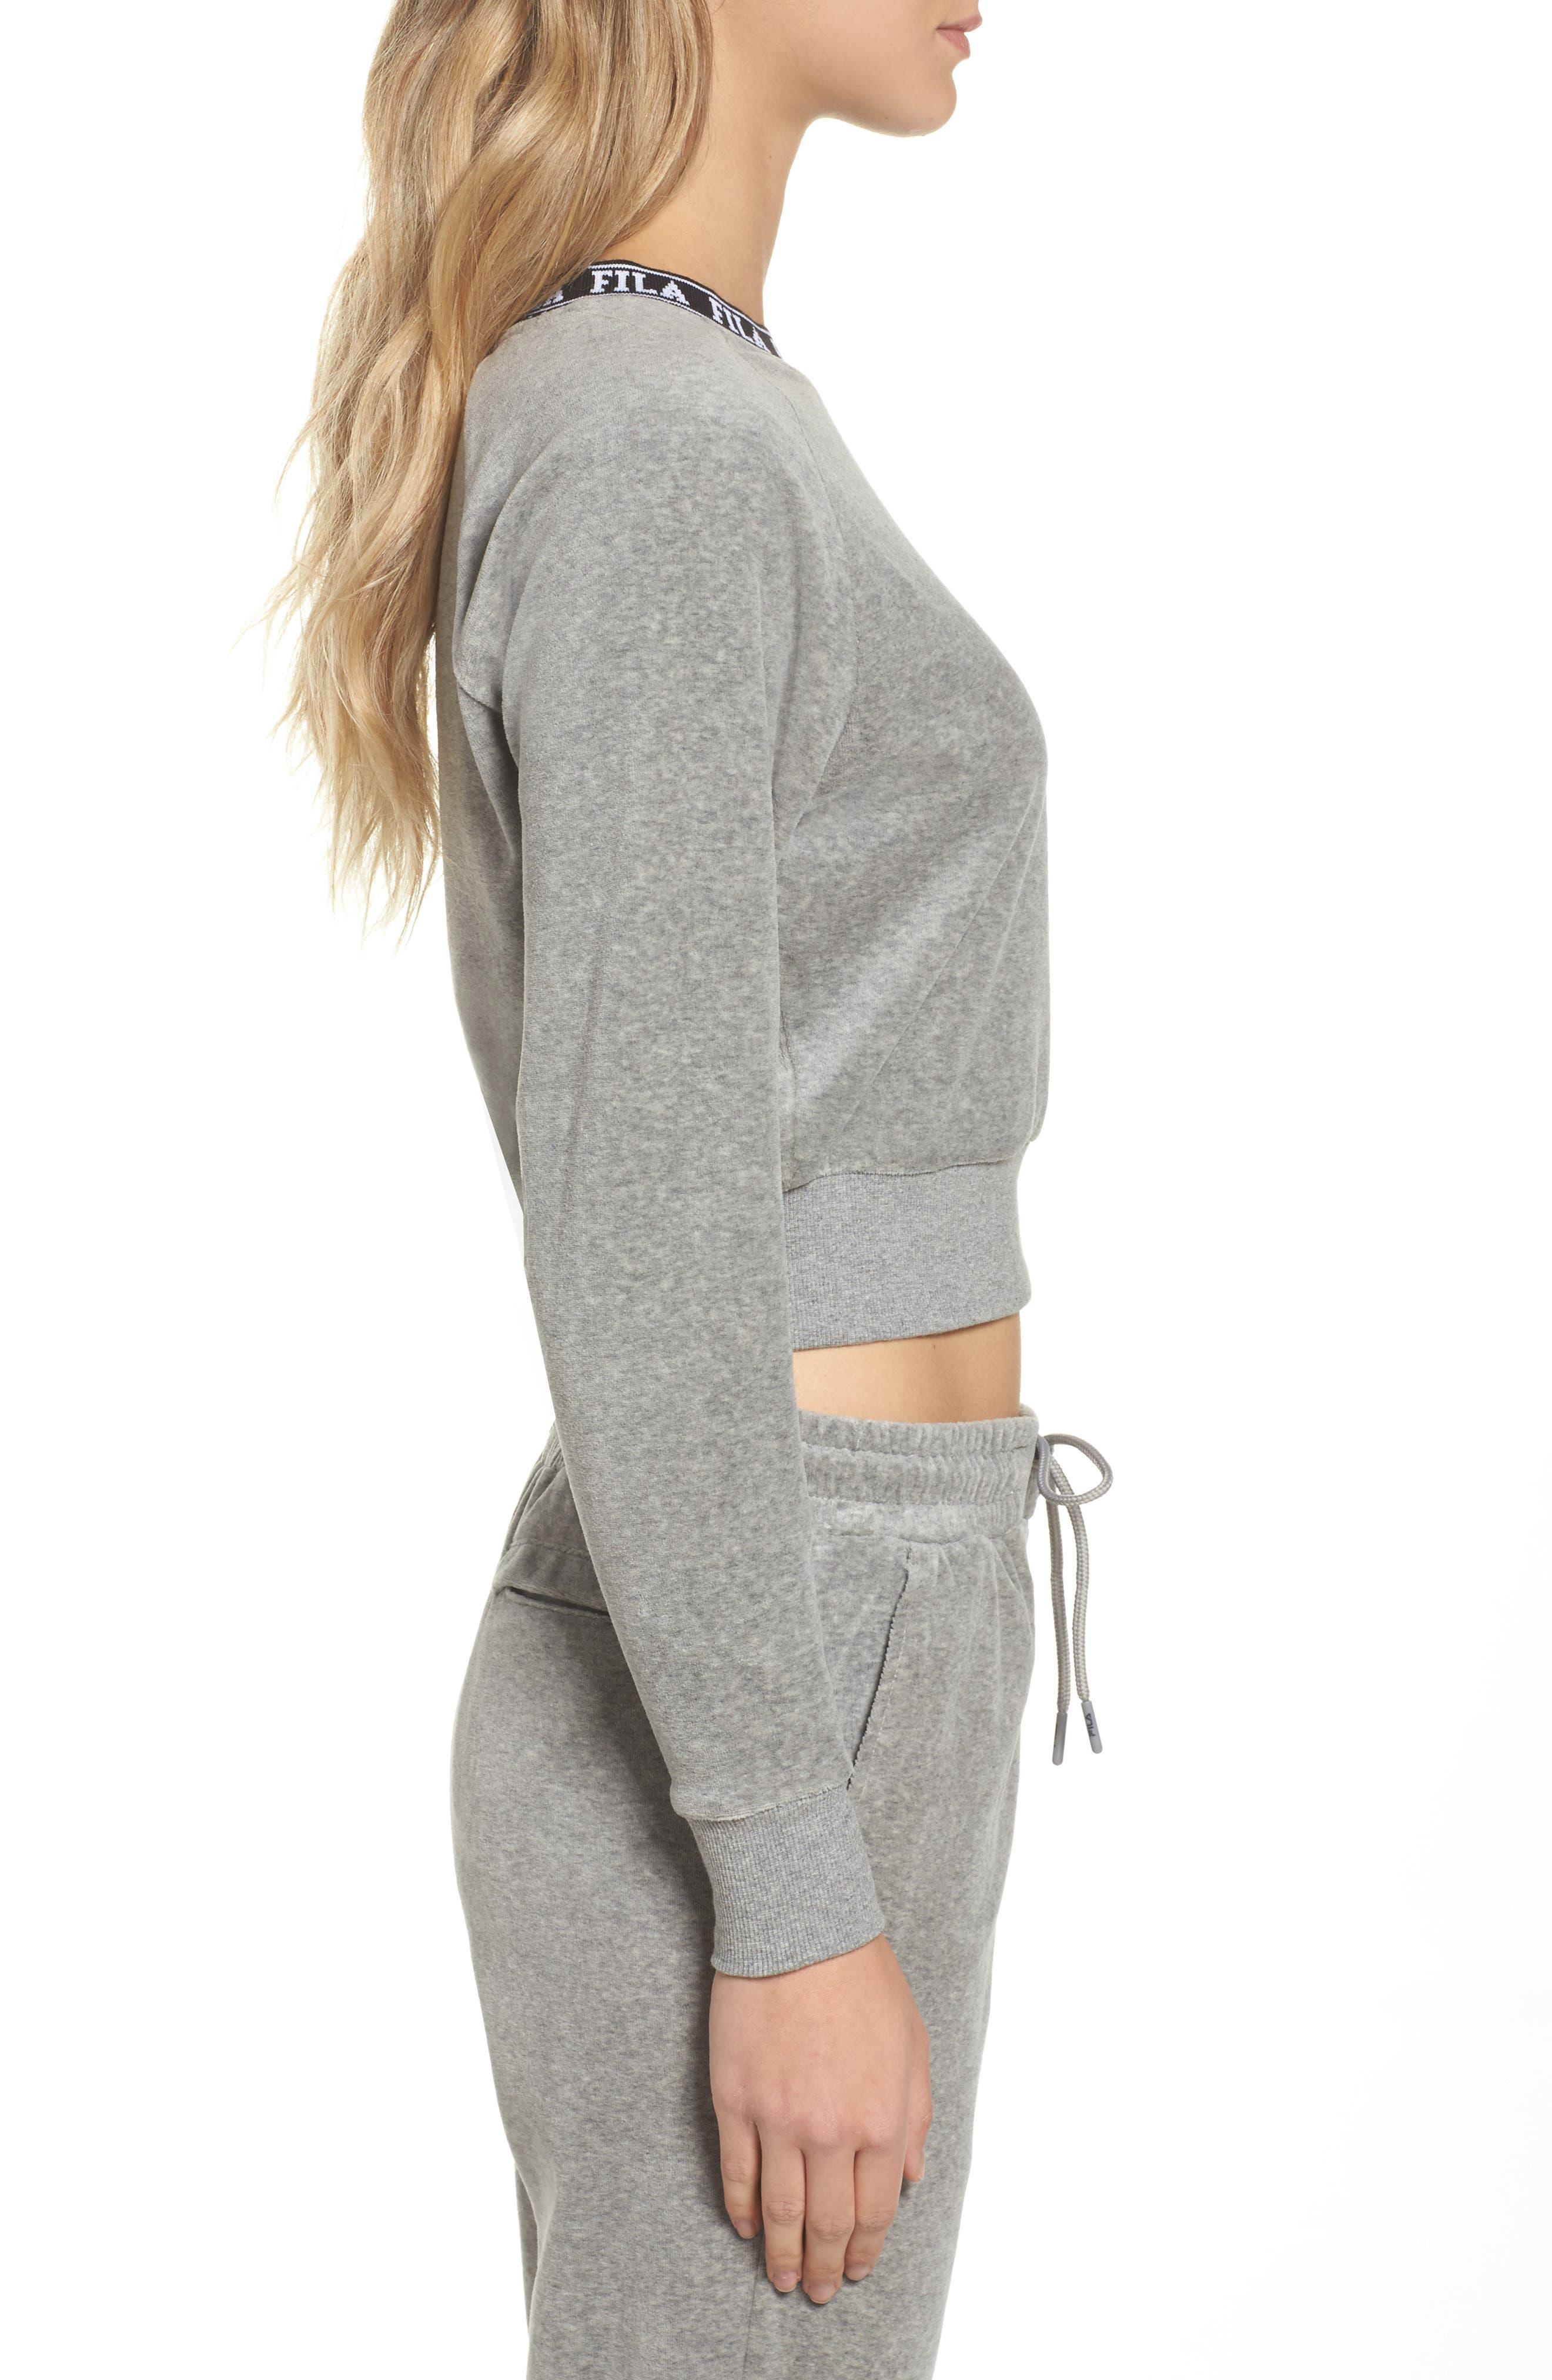 Dina Velour Crop Sweatshirt,                             Alternate thumbnail 3, color,                             Grey Heather/ Black/ White